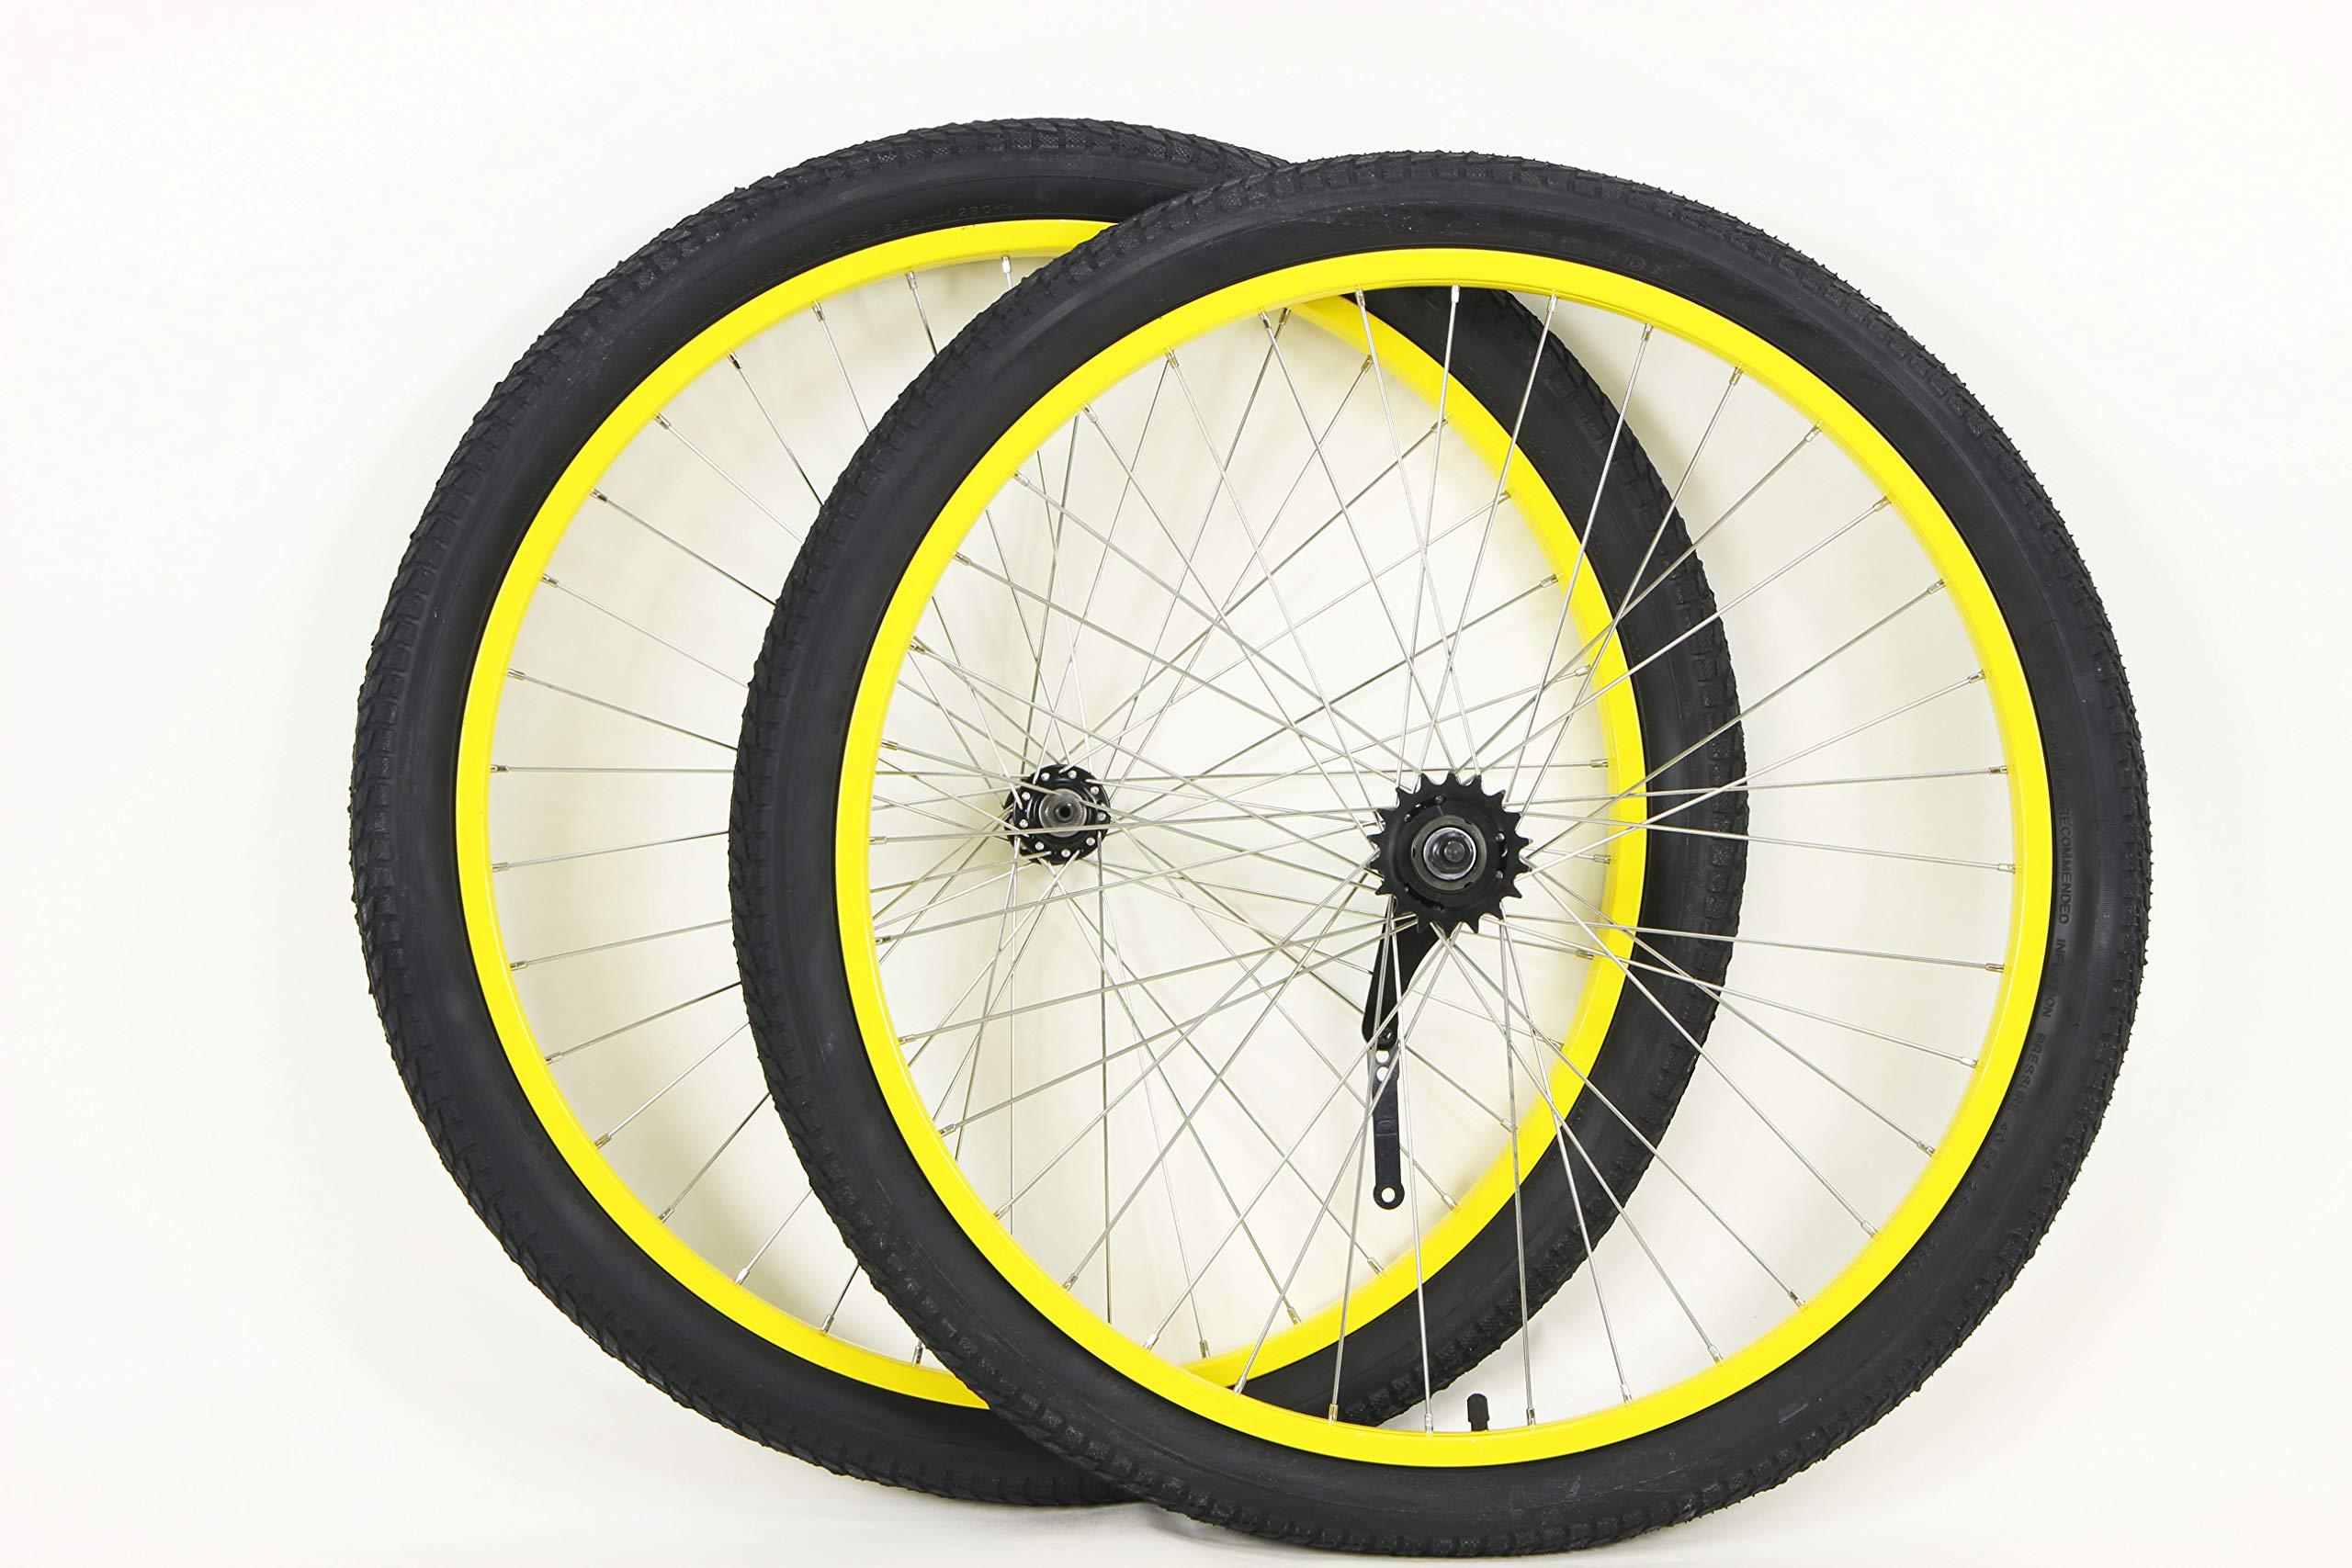 MANGO 26 inch Coaster Brake Wheel Set Beach Cruiser Bike Bicycle with Tires and Tubes! (Black) (Yellow)